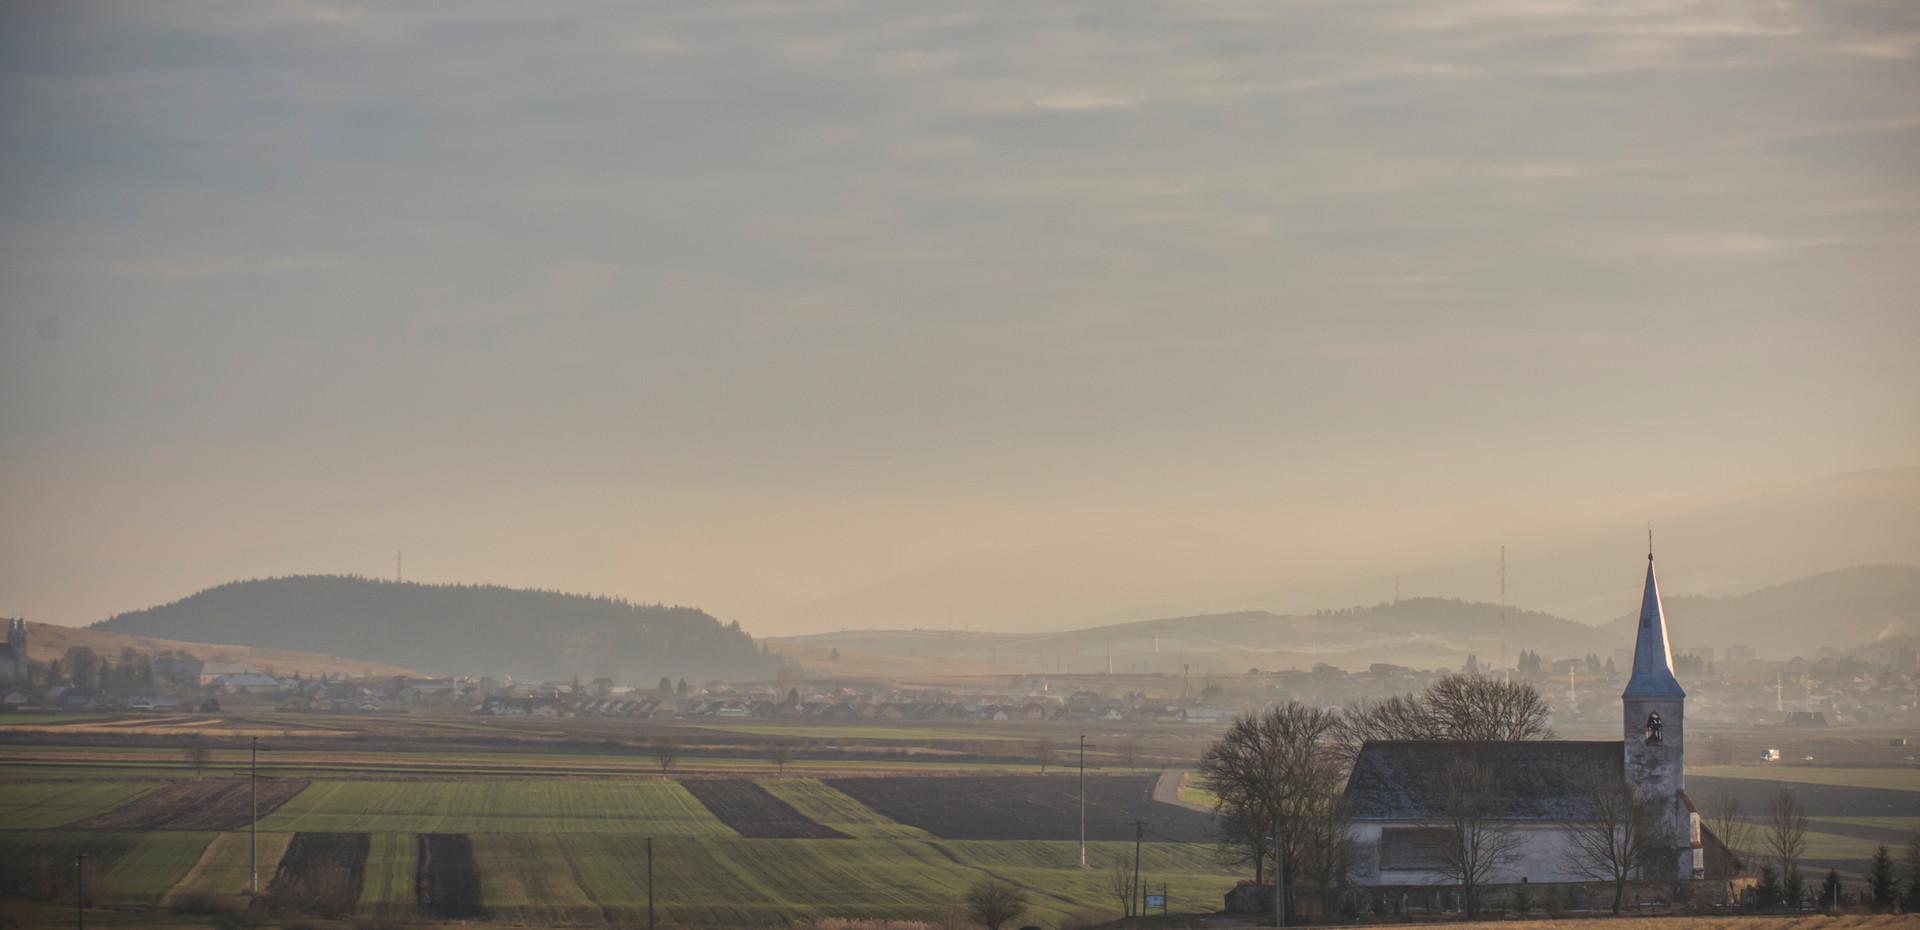 Csíkdelne / Delniță Harghita county / Hargita megye / Județul Harghita Romania / Románia / România / 2017